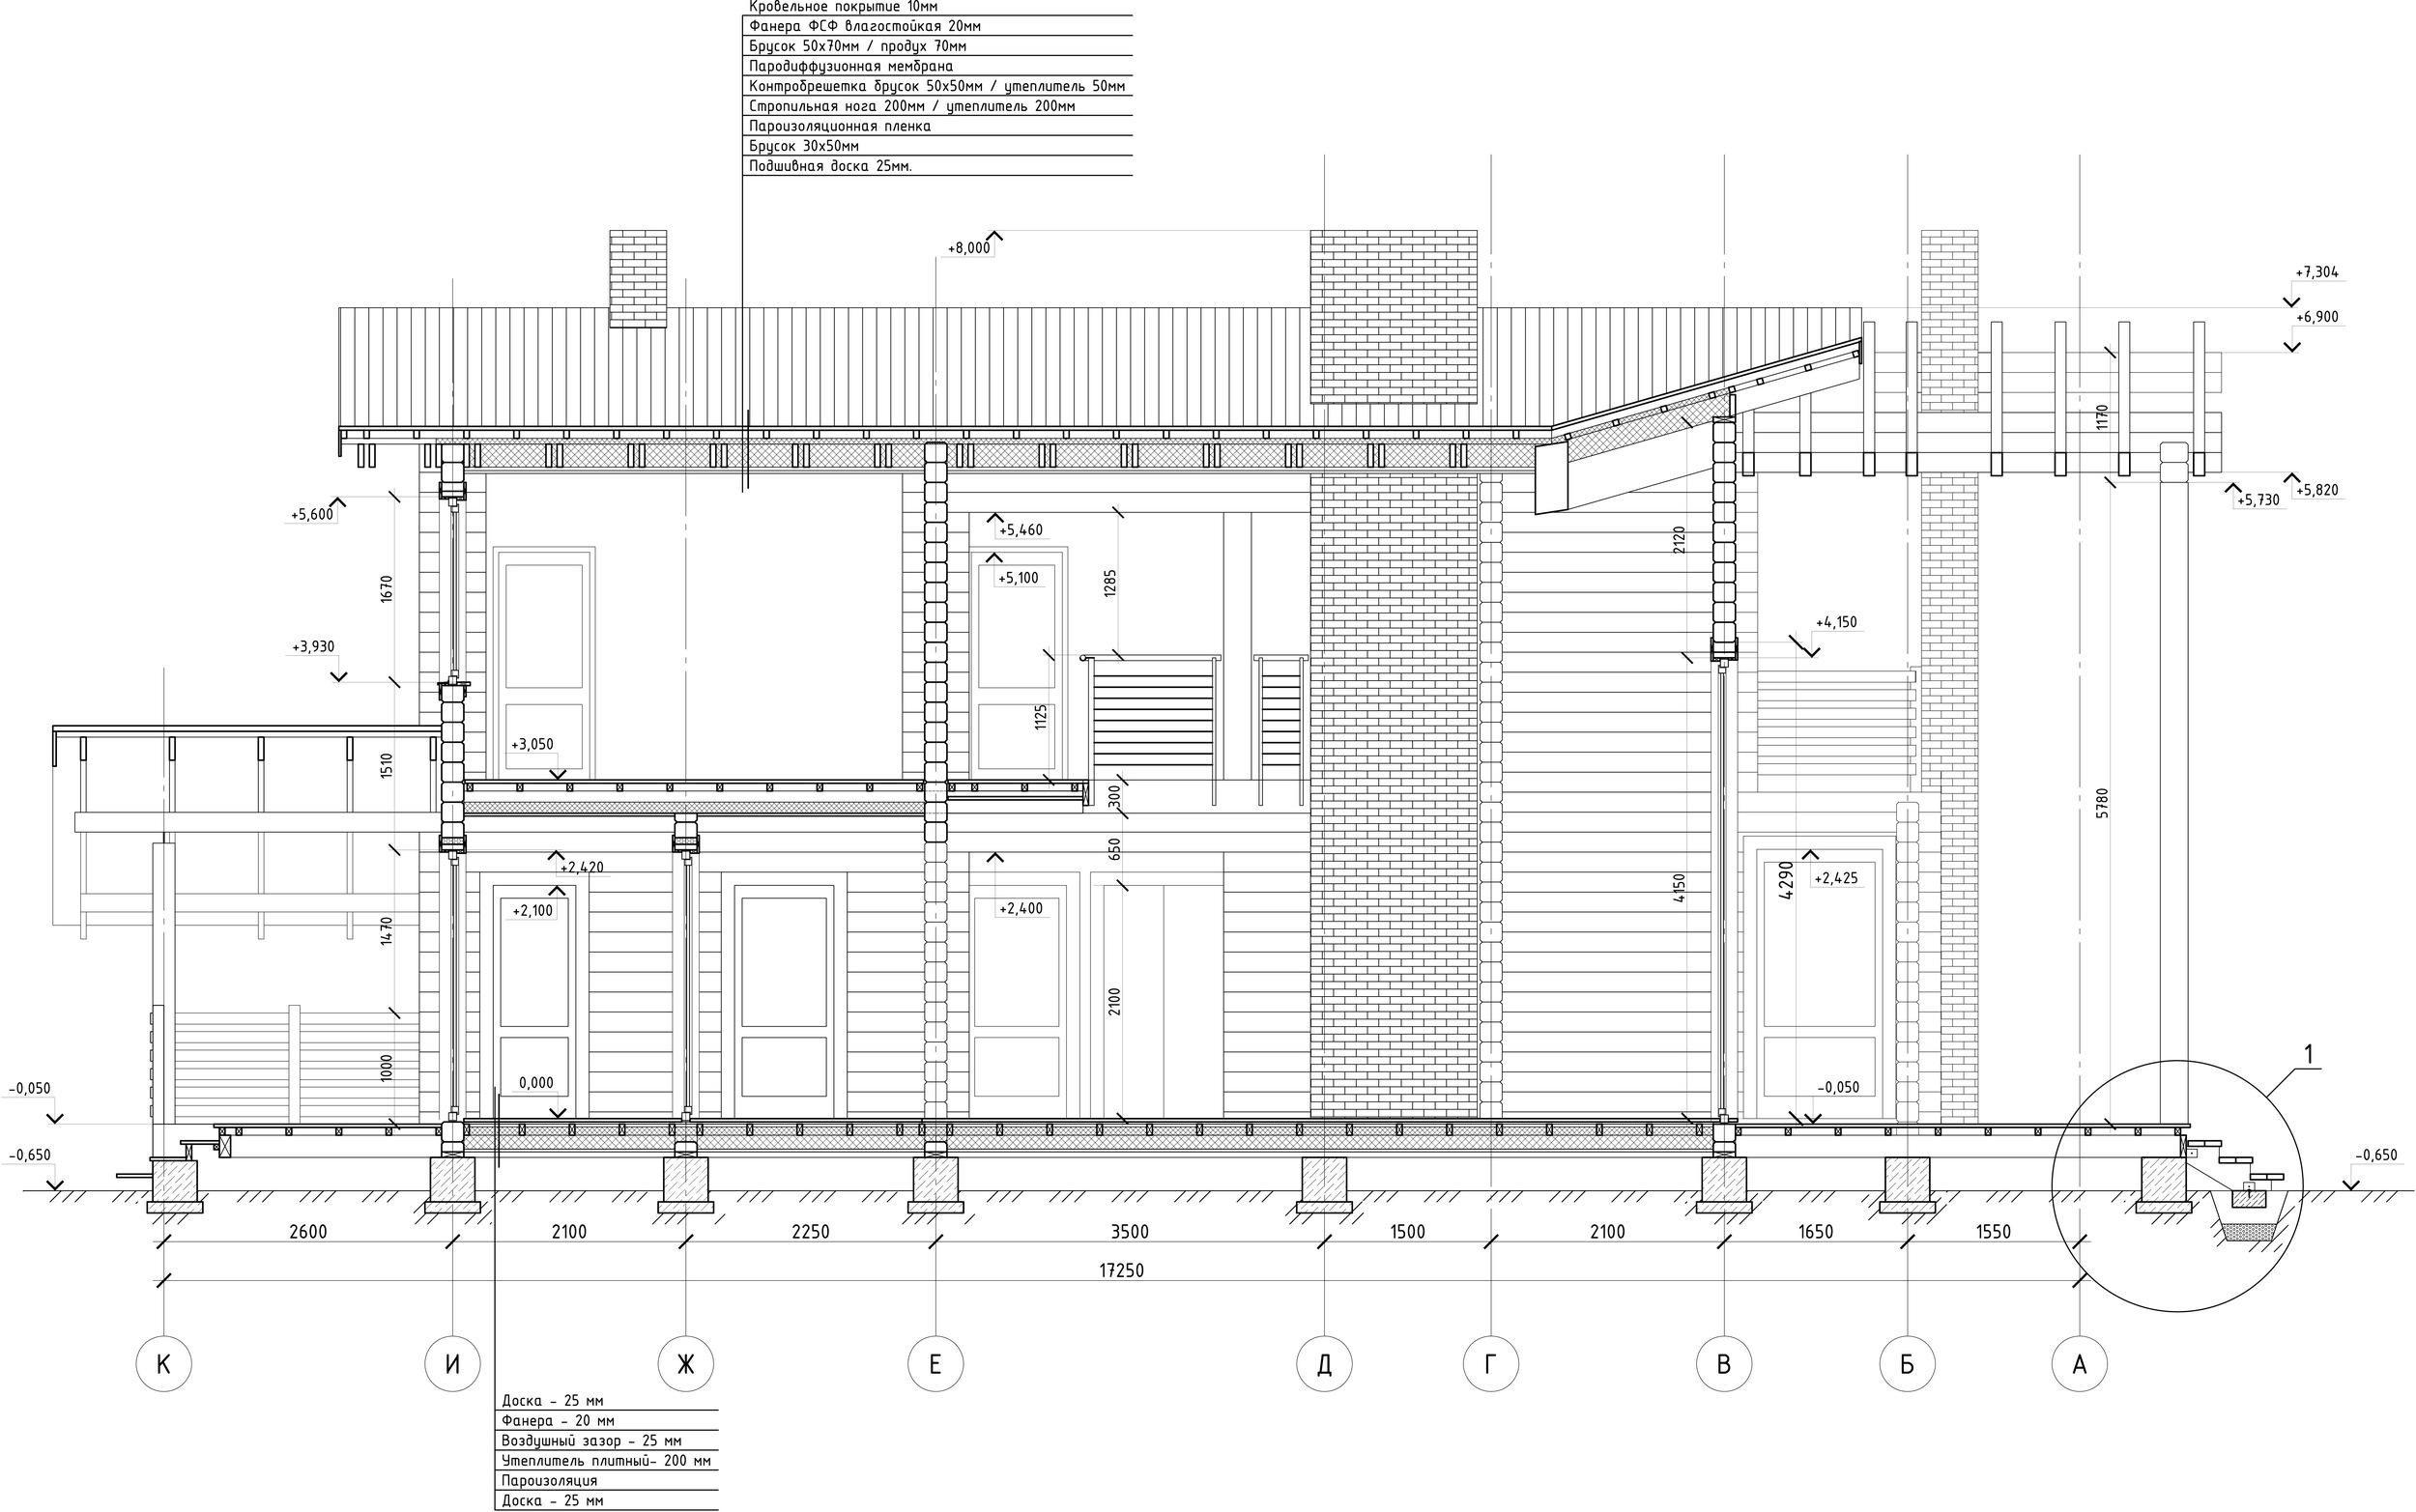 PLANI_27 02 12 Model (1).jpg